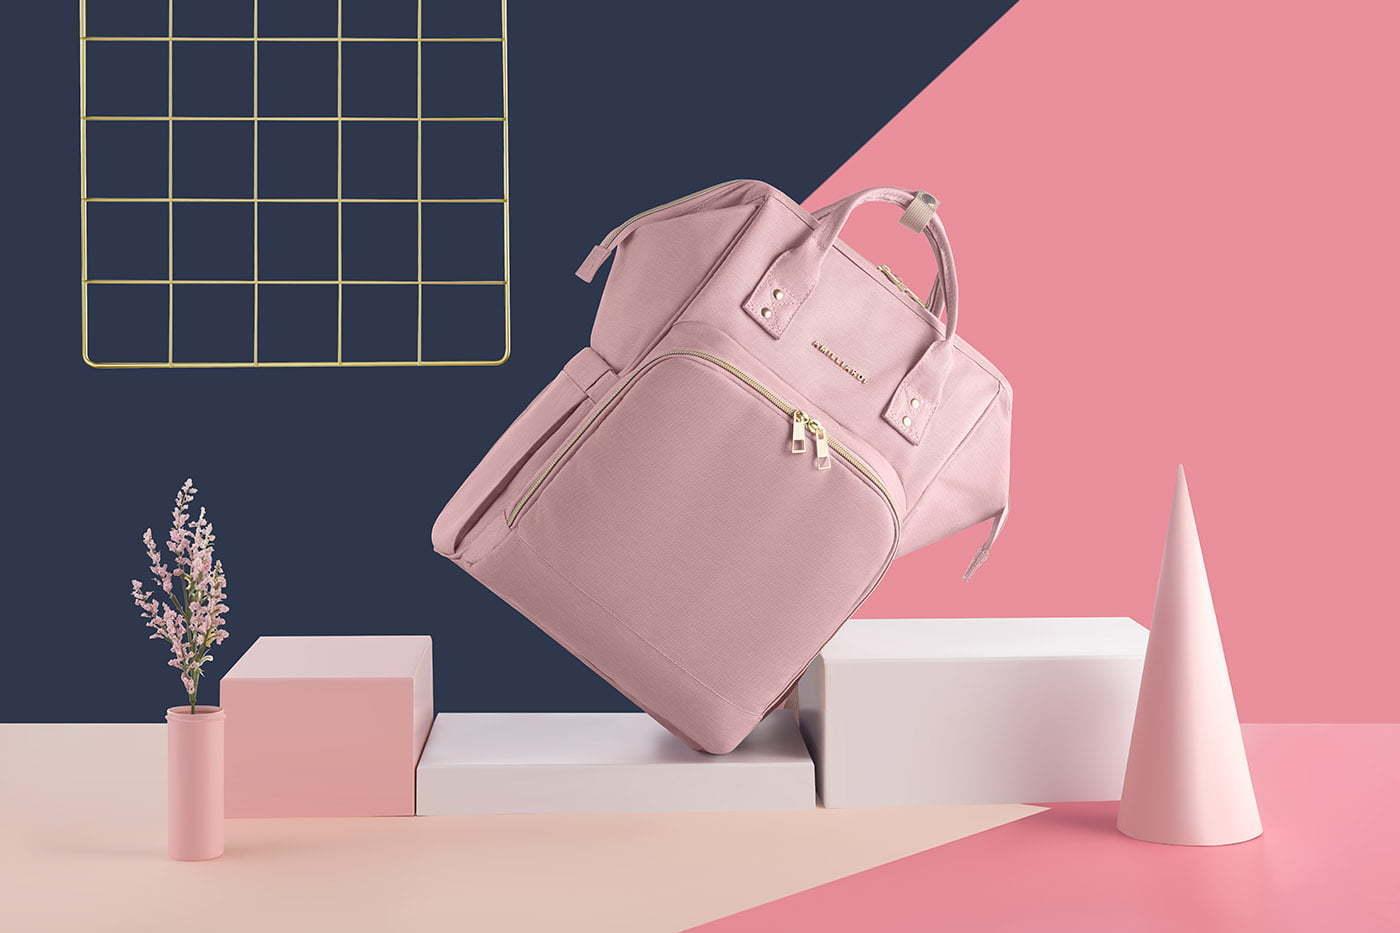 A photo of a handbag lifestyle photo